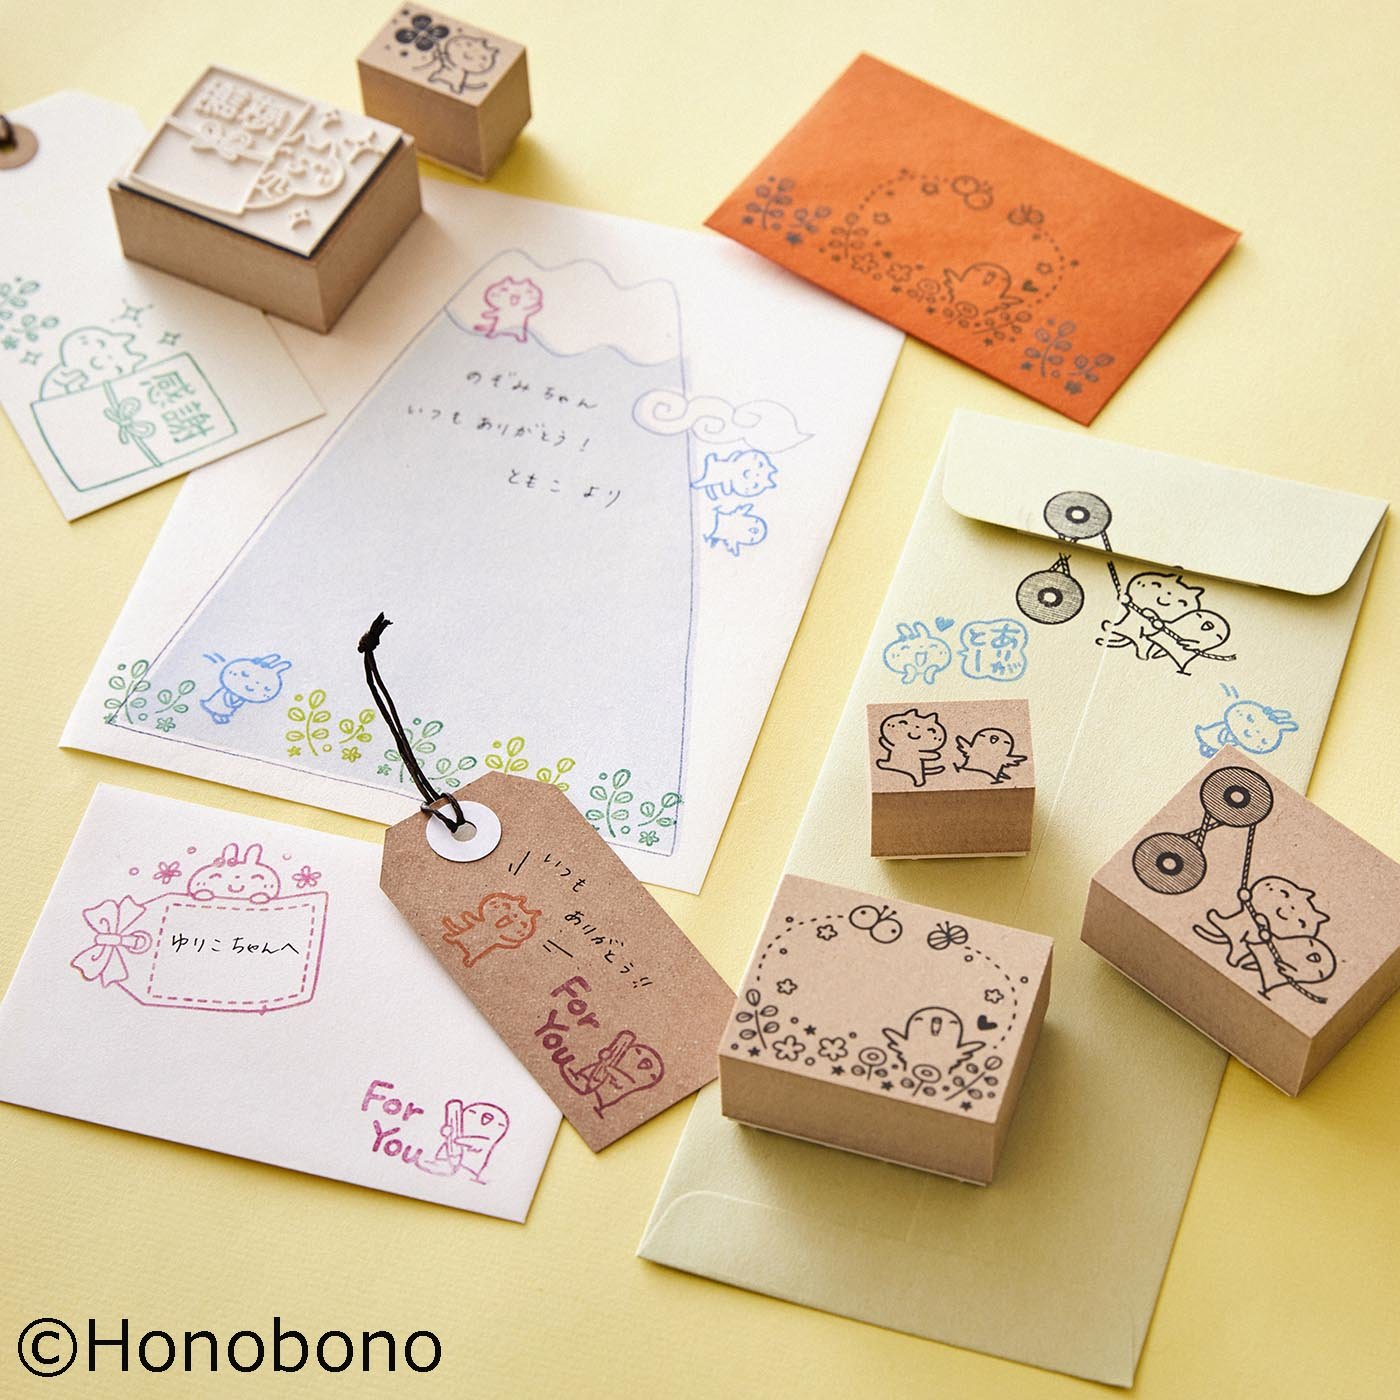 Honobono family ポンポン押して思い届ける スタンプセットの会